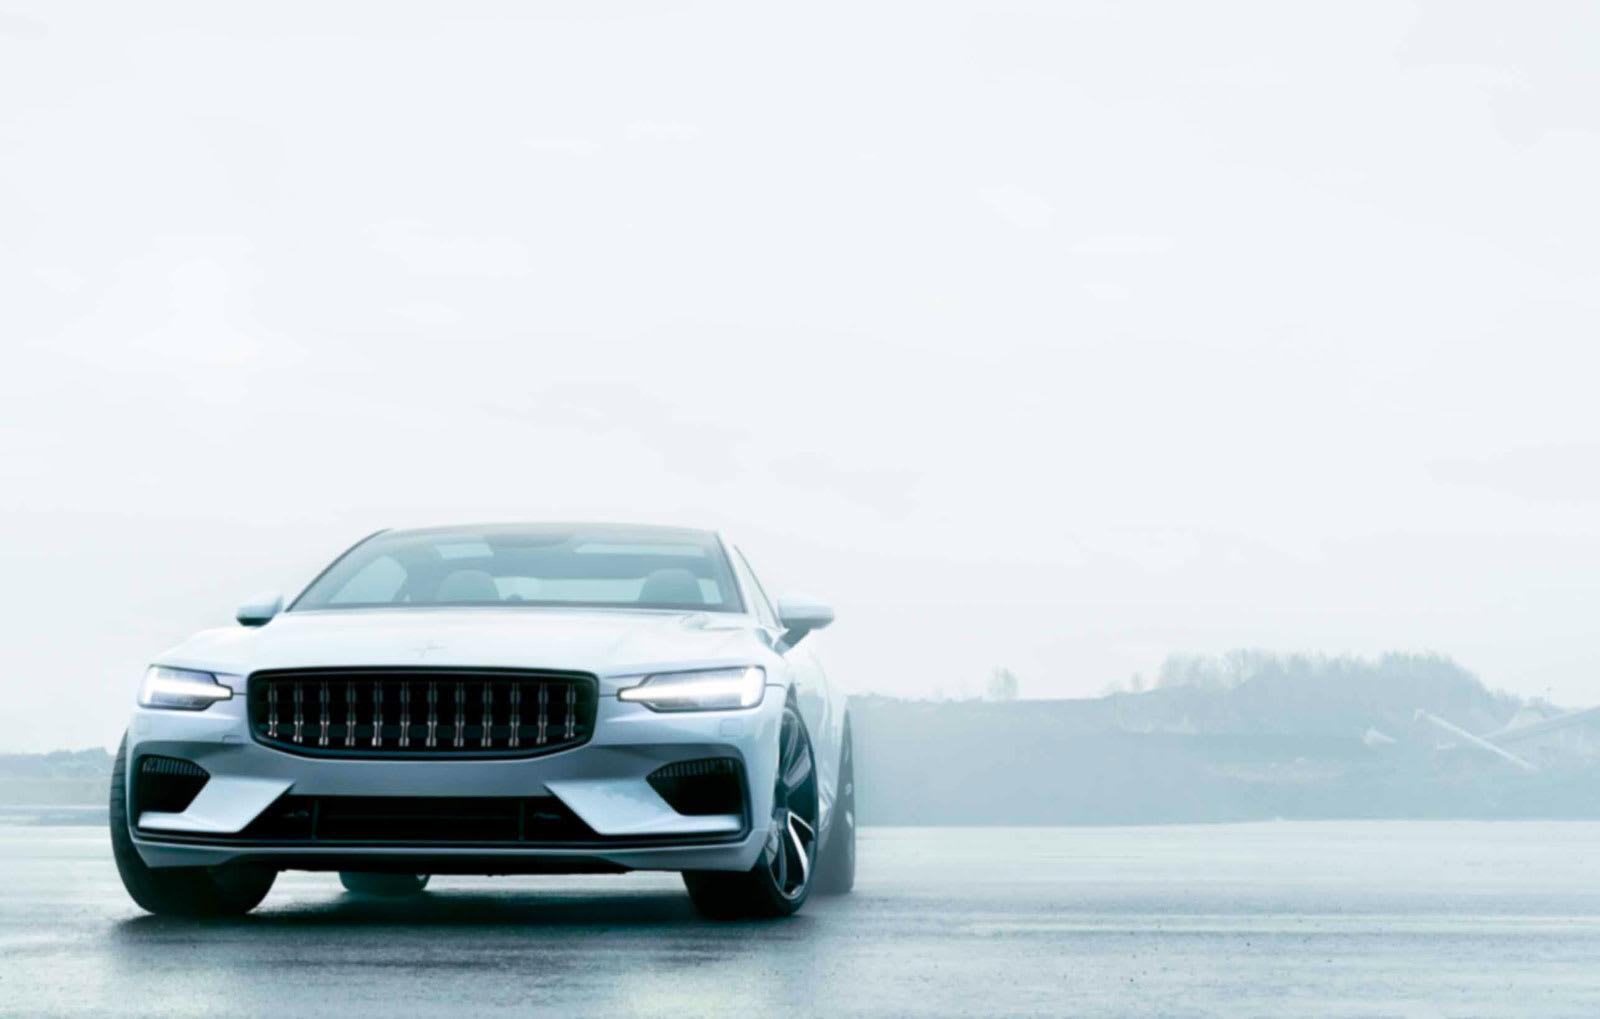 Volvo S Polestar 1 Luxury Hybrid Will Cost 155 000